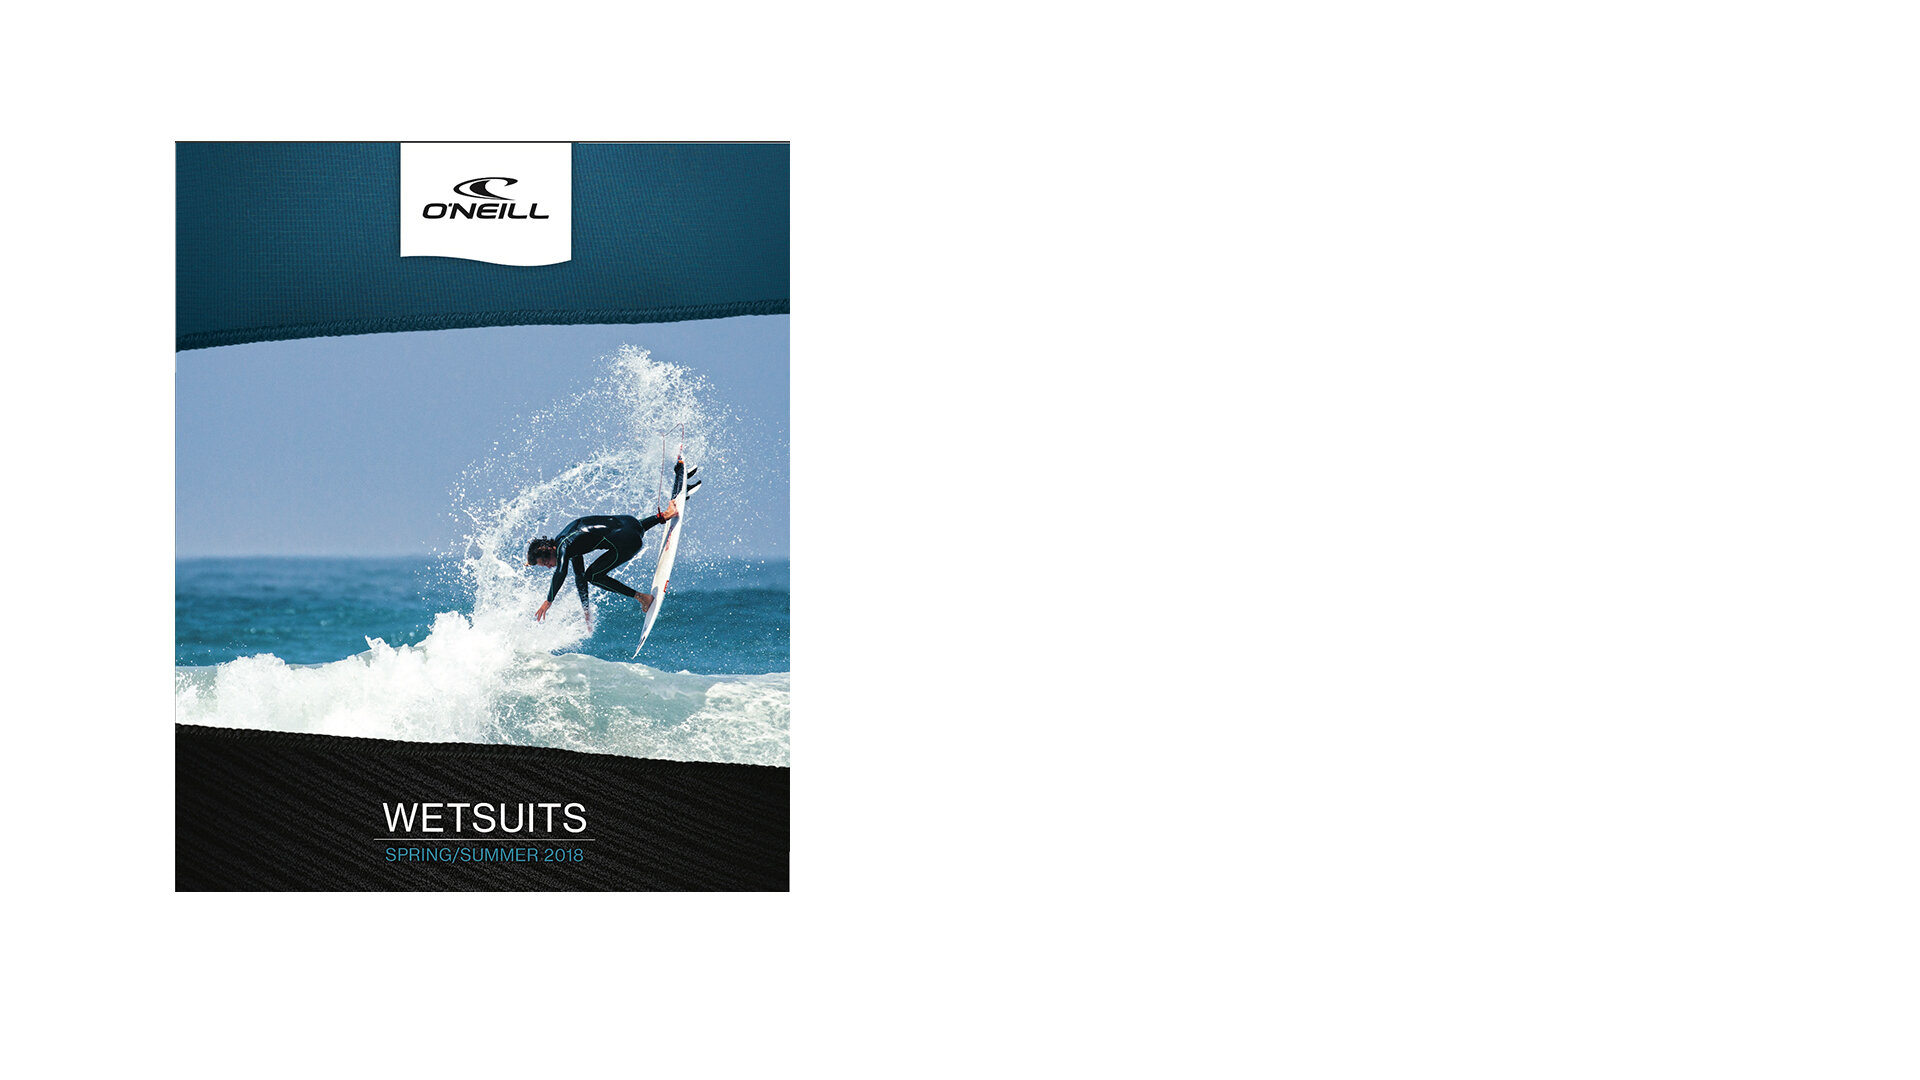 toby-butler-tobybutlerphoto-surf-surfing-waterphotography-ocean-Oneill-wetsuits-swimwear-girl-bikini-clothing-surf-portugal-lifestylephotography-10.jpg